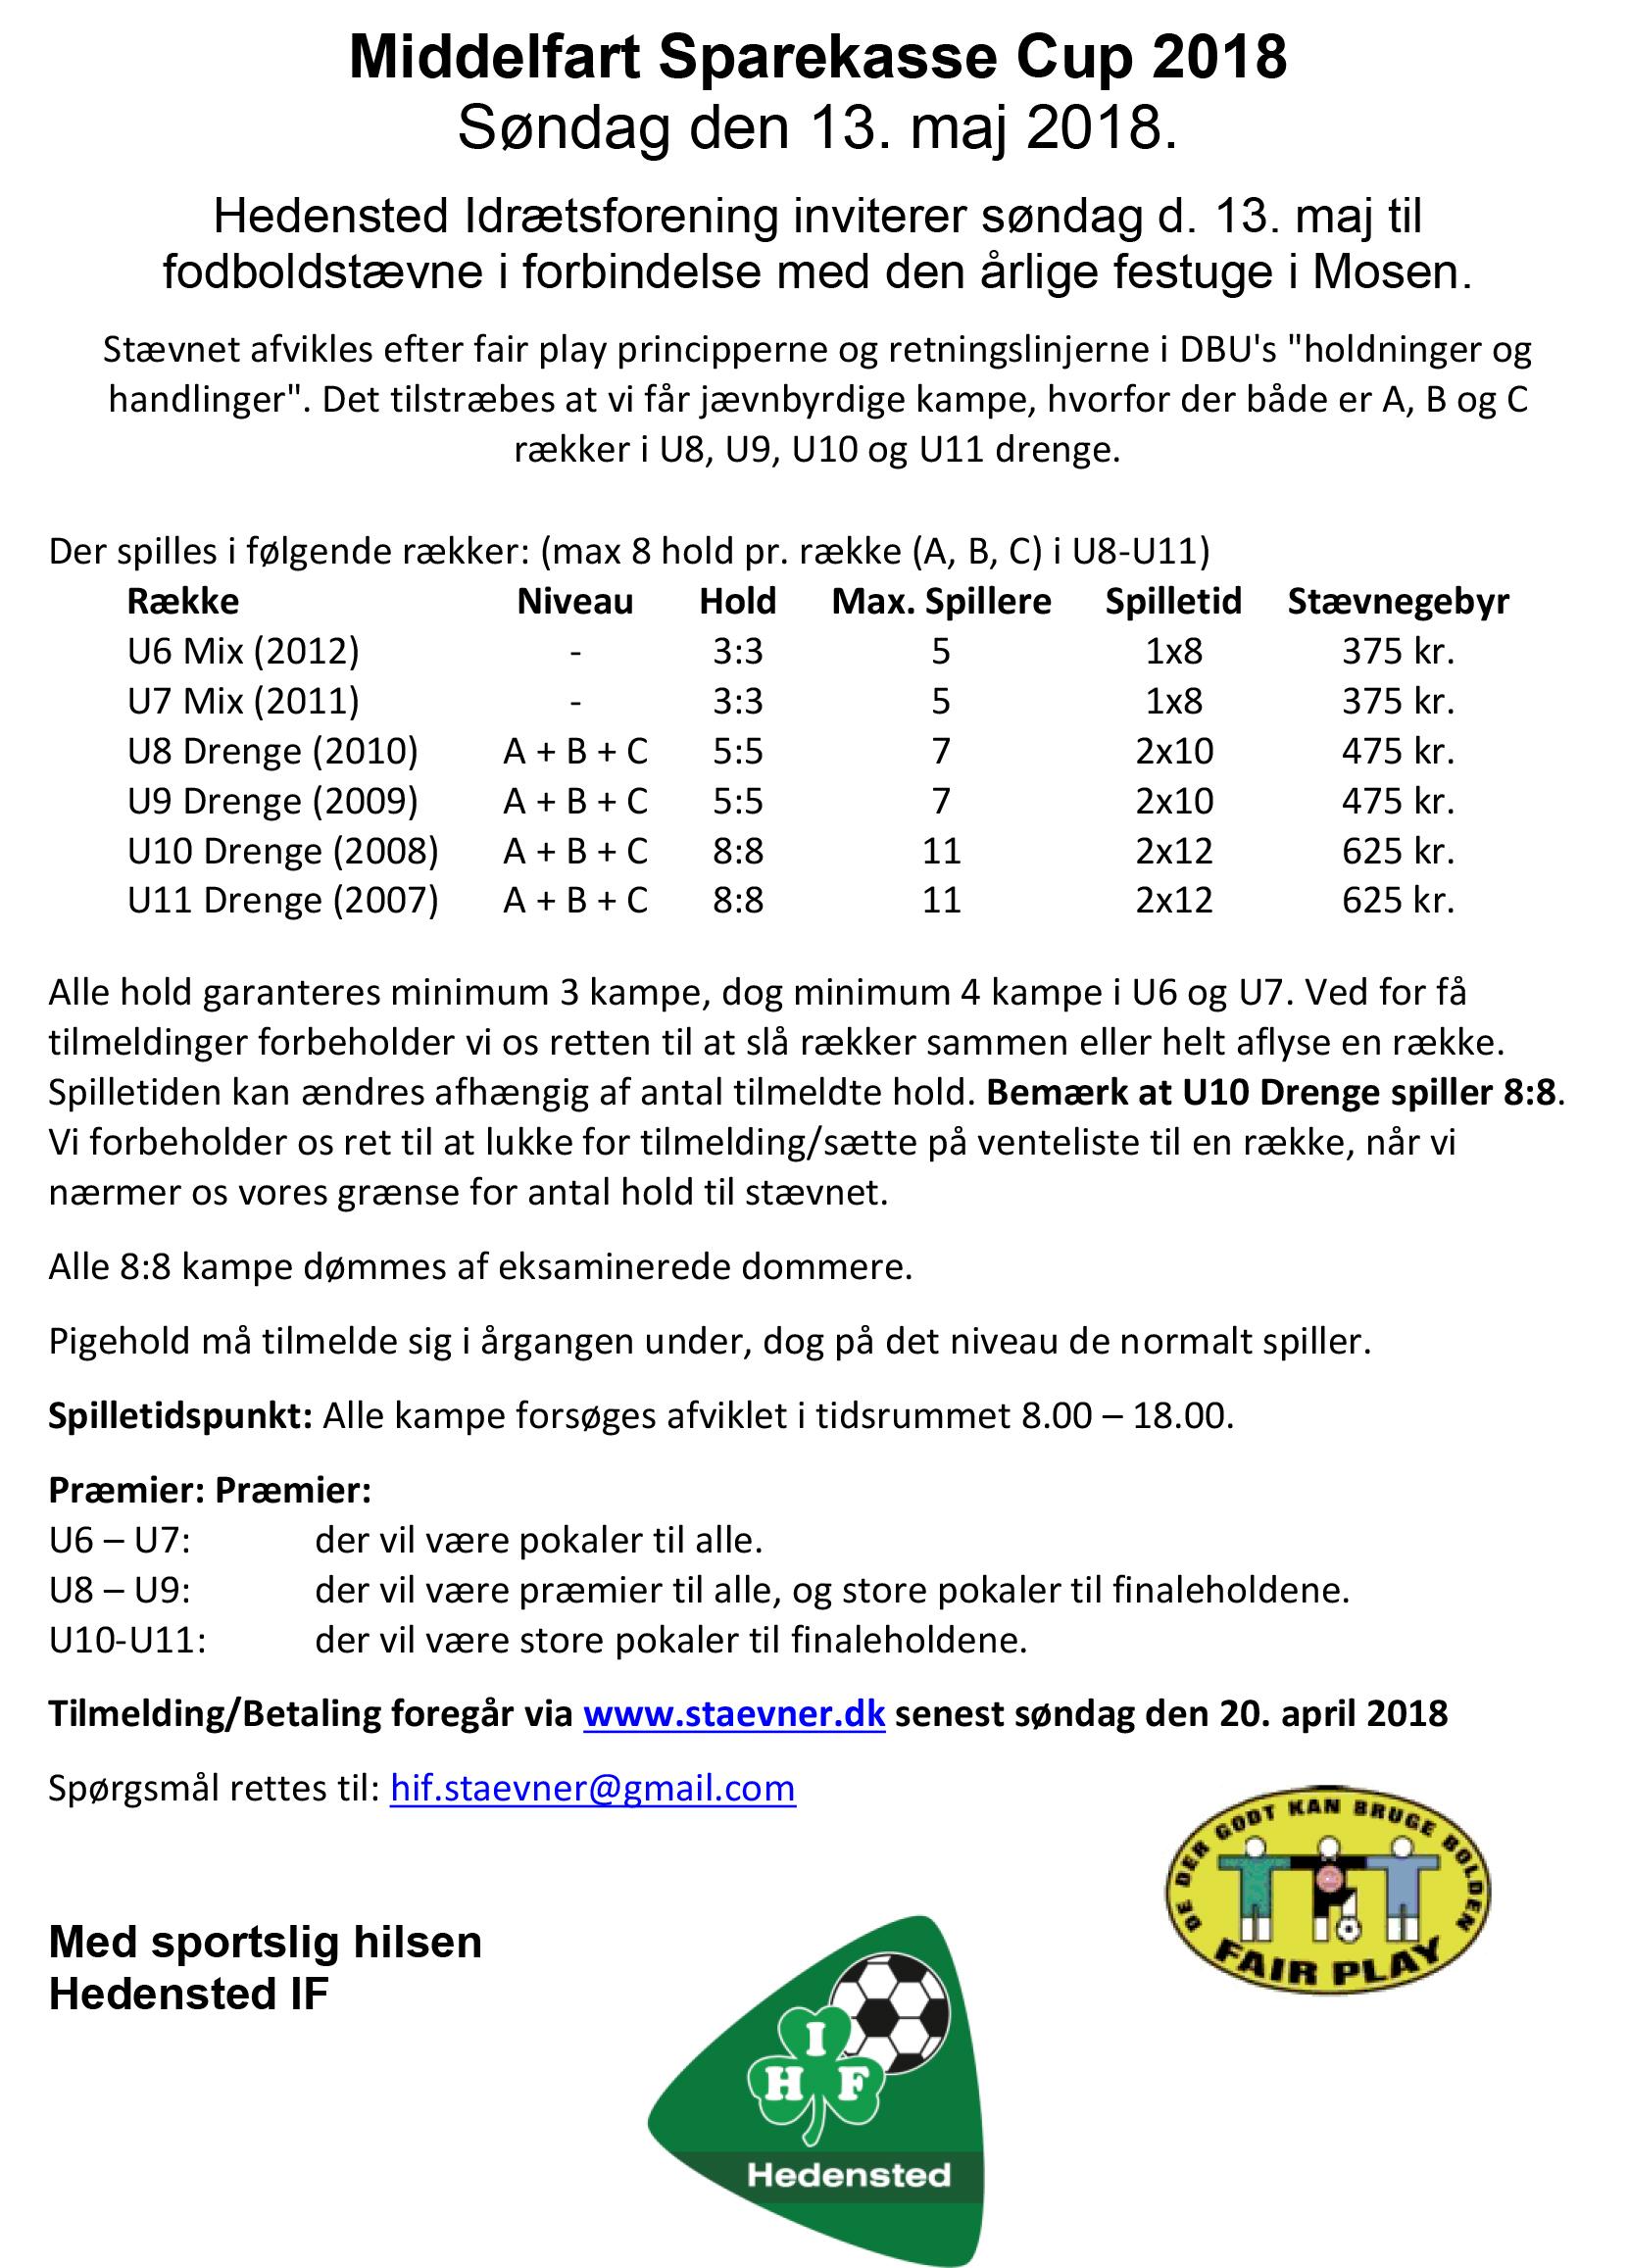 Middelfart Sparekasse Cup 2018_Invitation_Hedensted IF